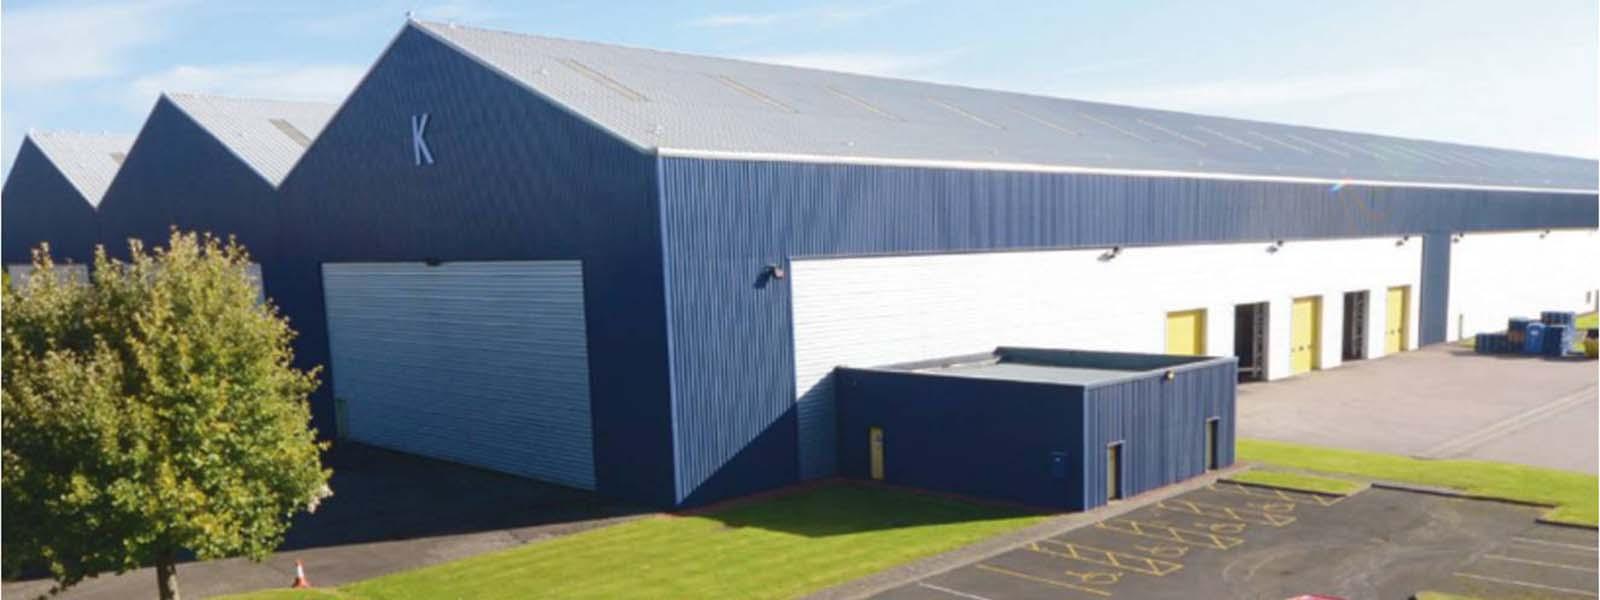 The Westway Park facility. Photo via NMIS.